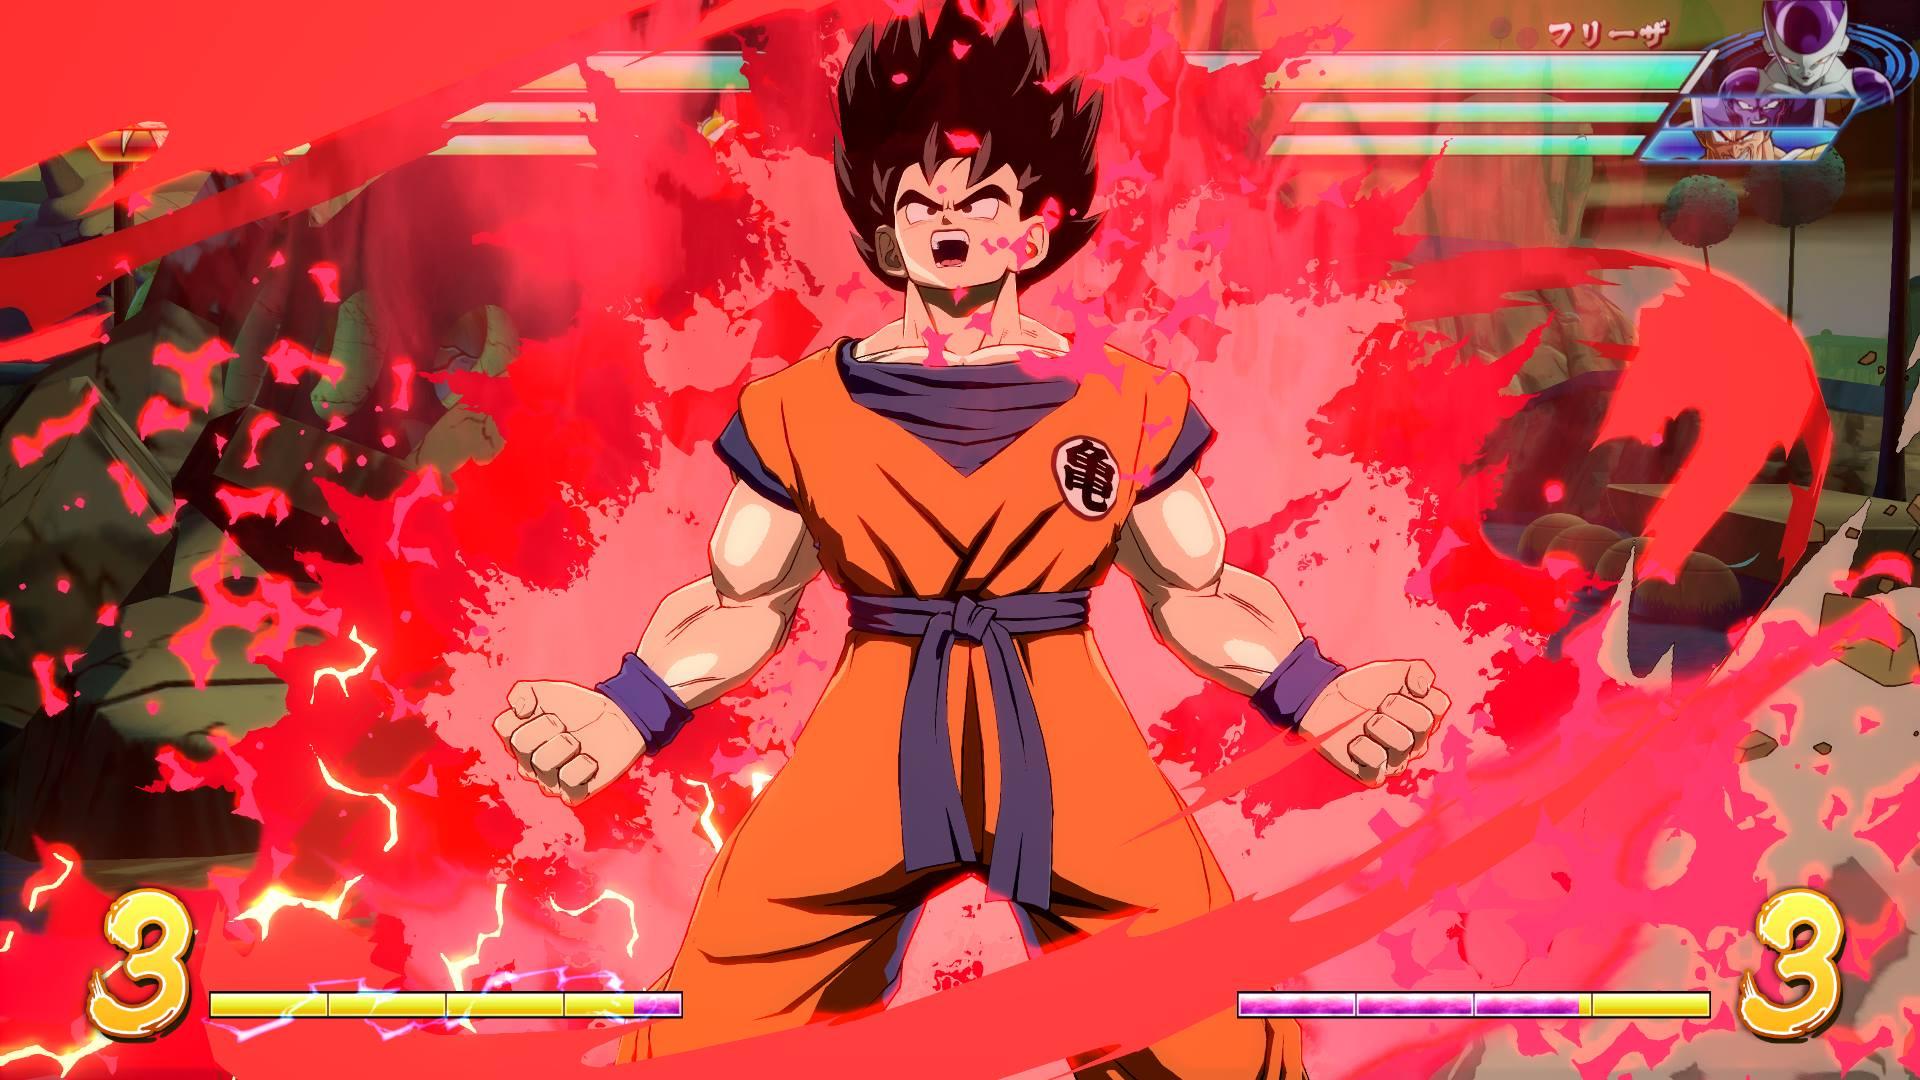 Bandai Namco gives us our first look at Dragon Ball FighterZ's Base Goku/Vegeta DLC screenshot